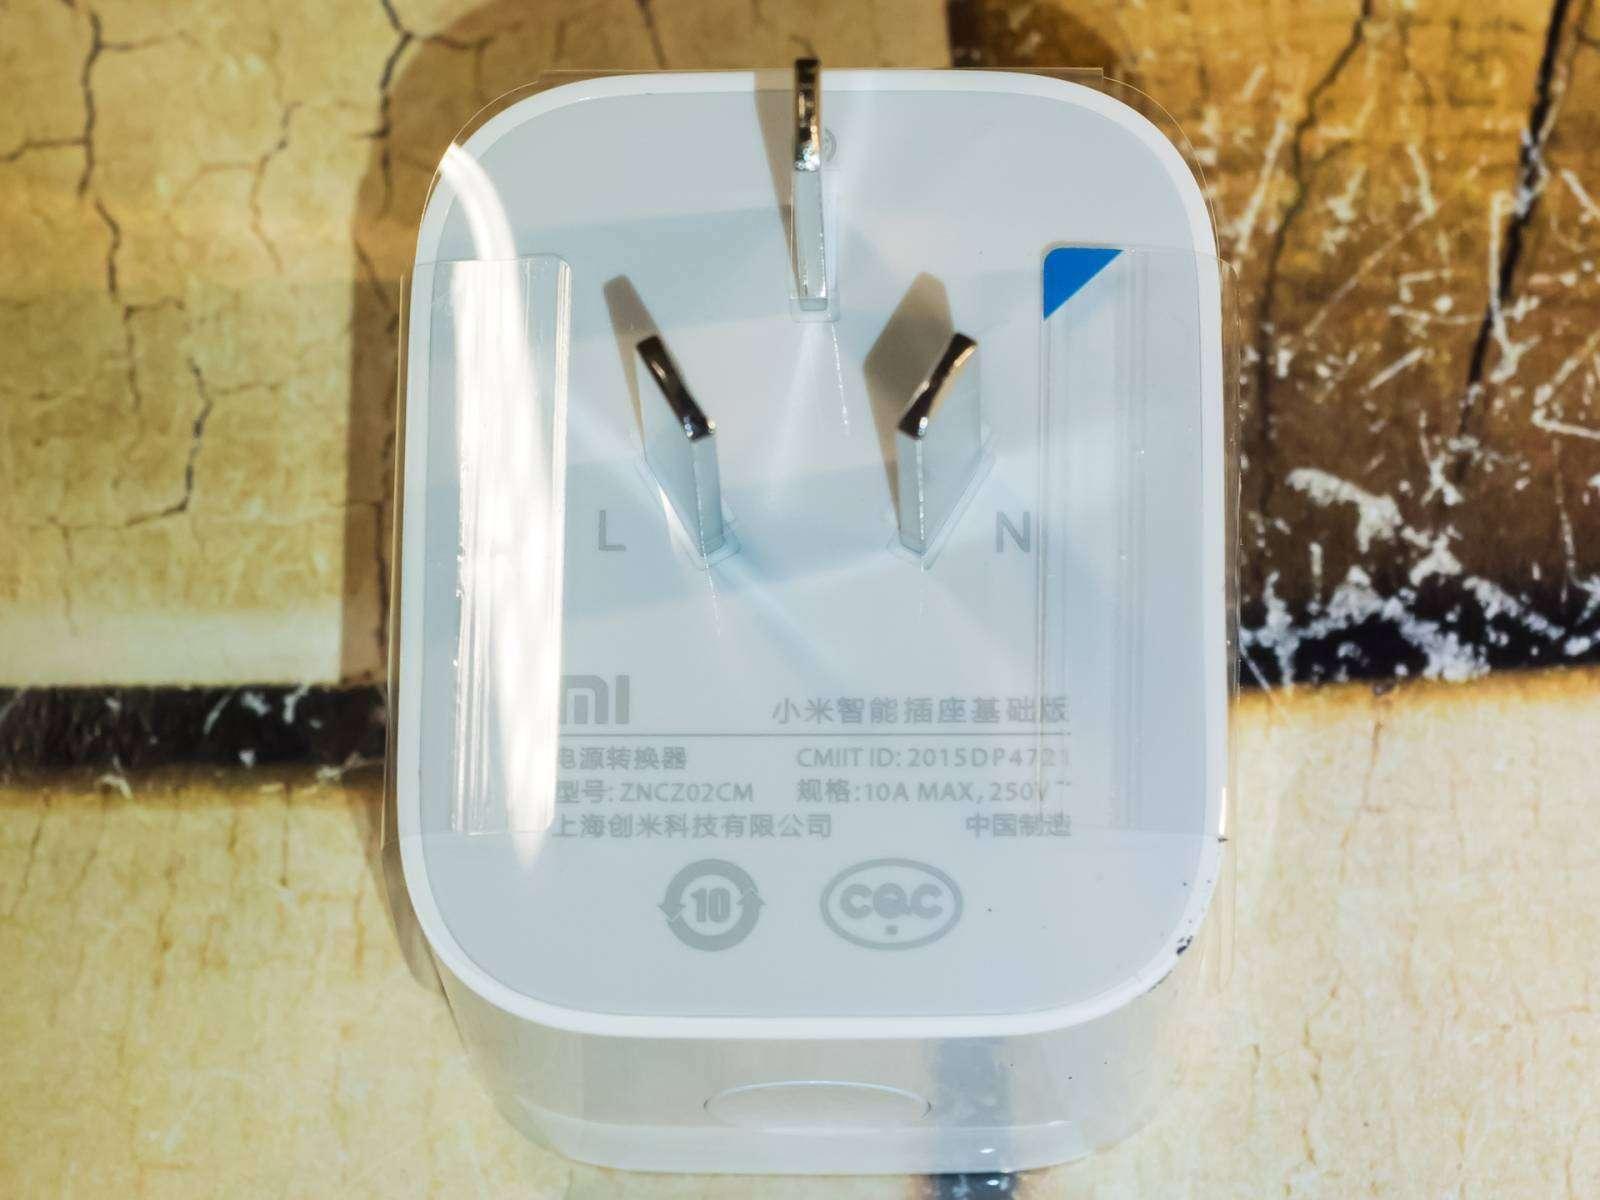 GearBest: Умная розетка Xiaomi Mi Smart - Wi-fi версия